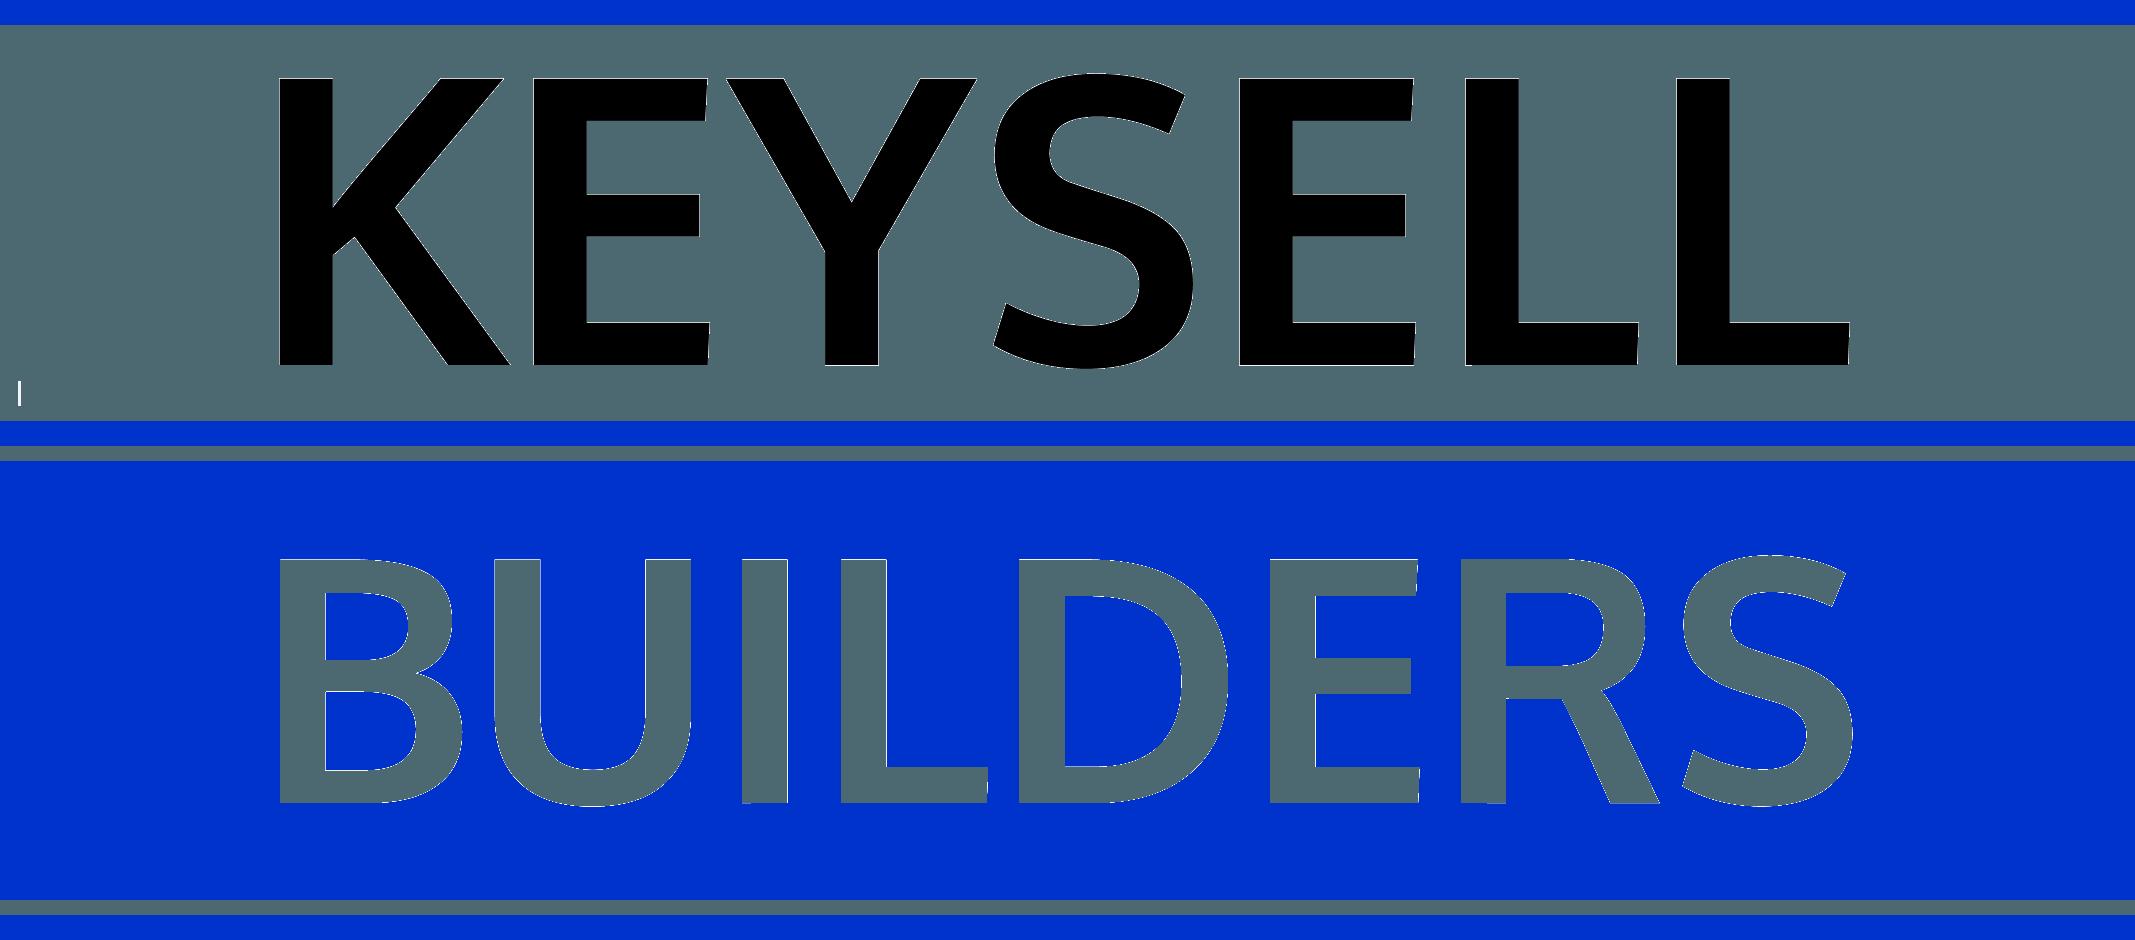 Keysell Builders logo